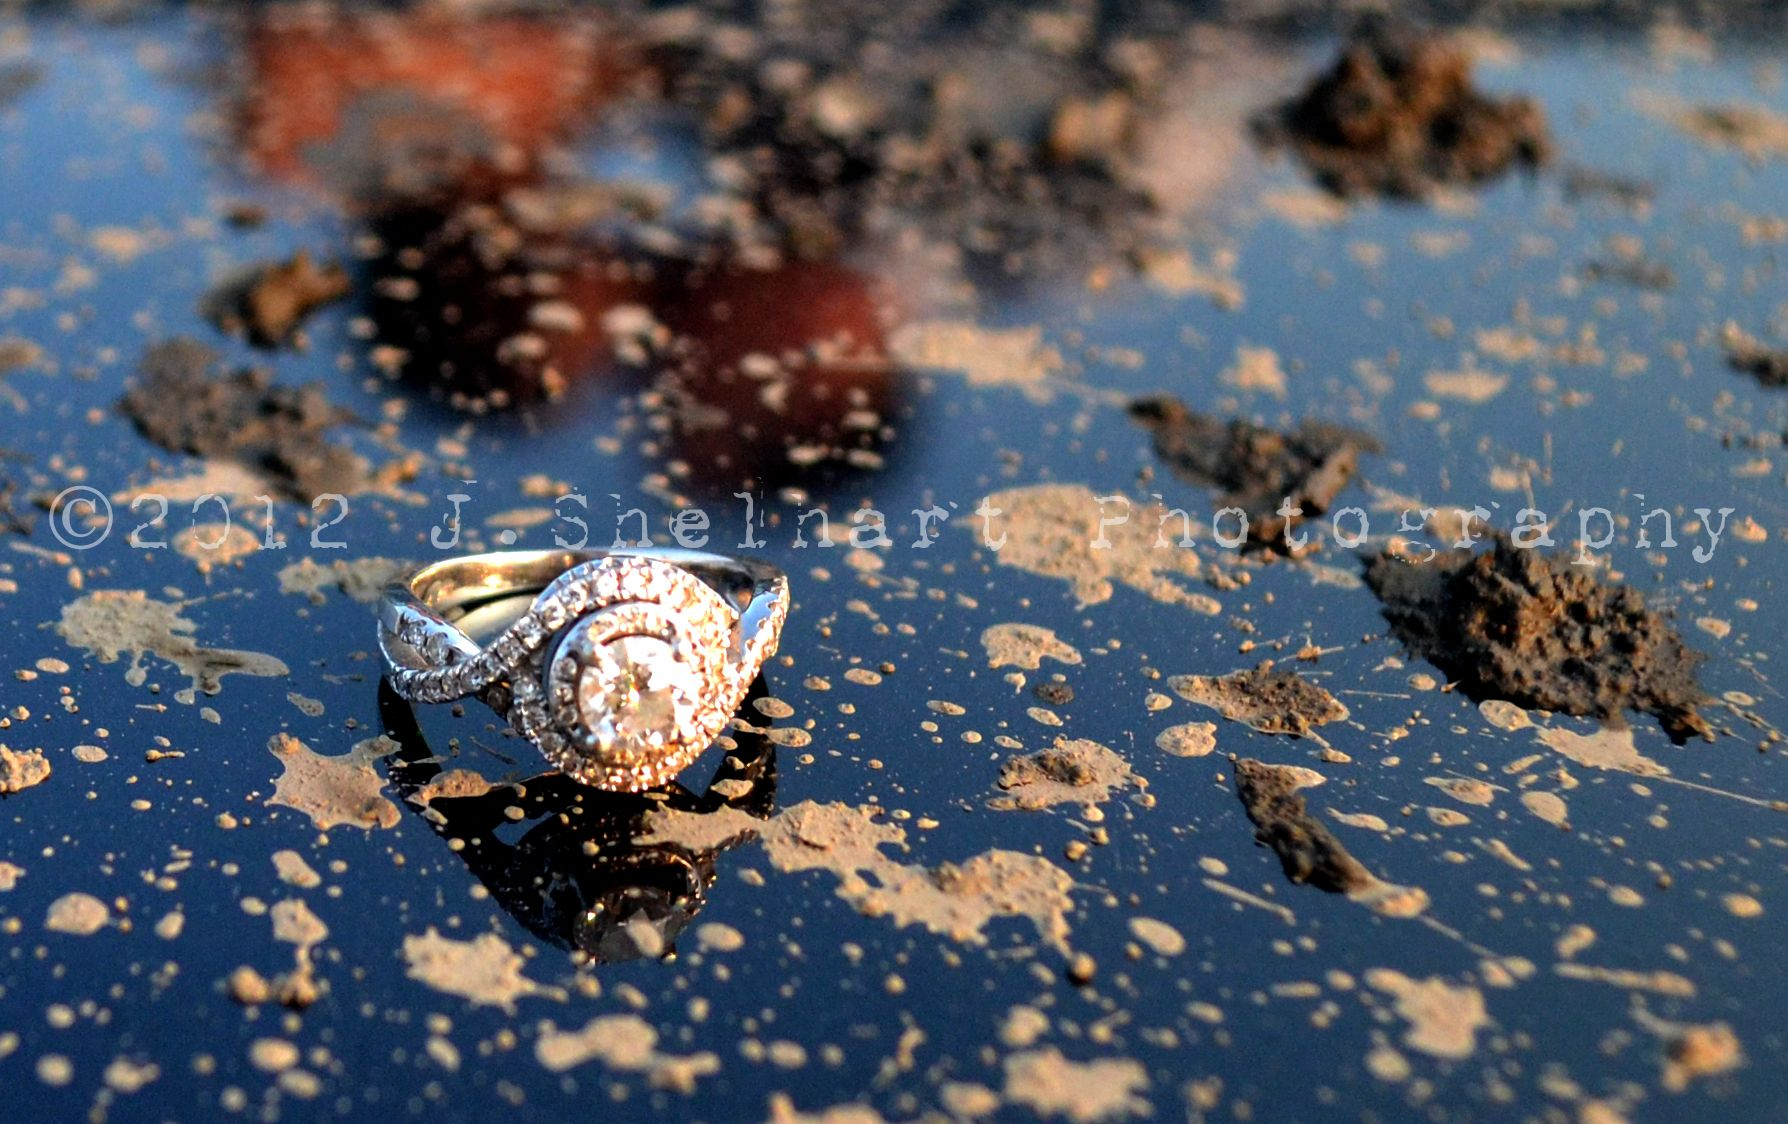 mudding wedding rings jeep engagement ring offroad mudding reflection